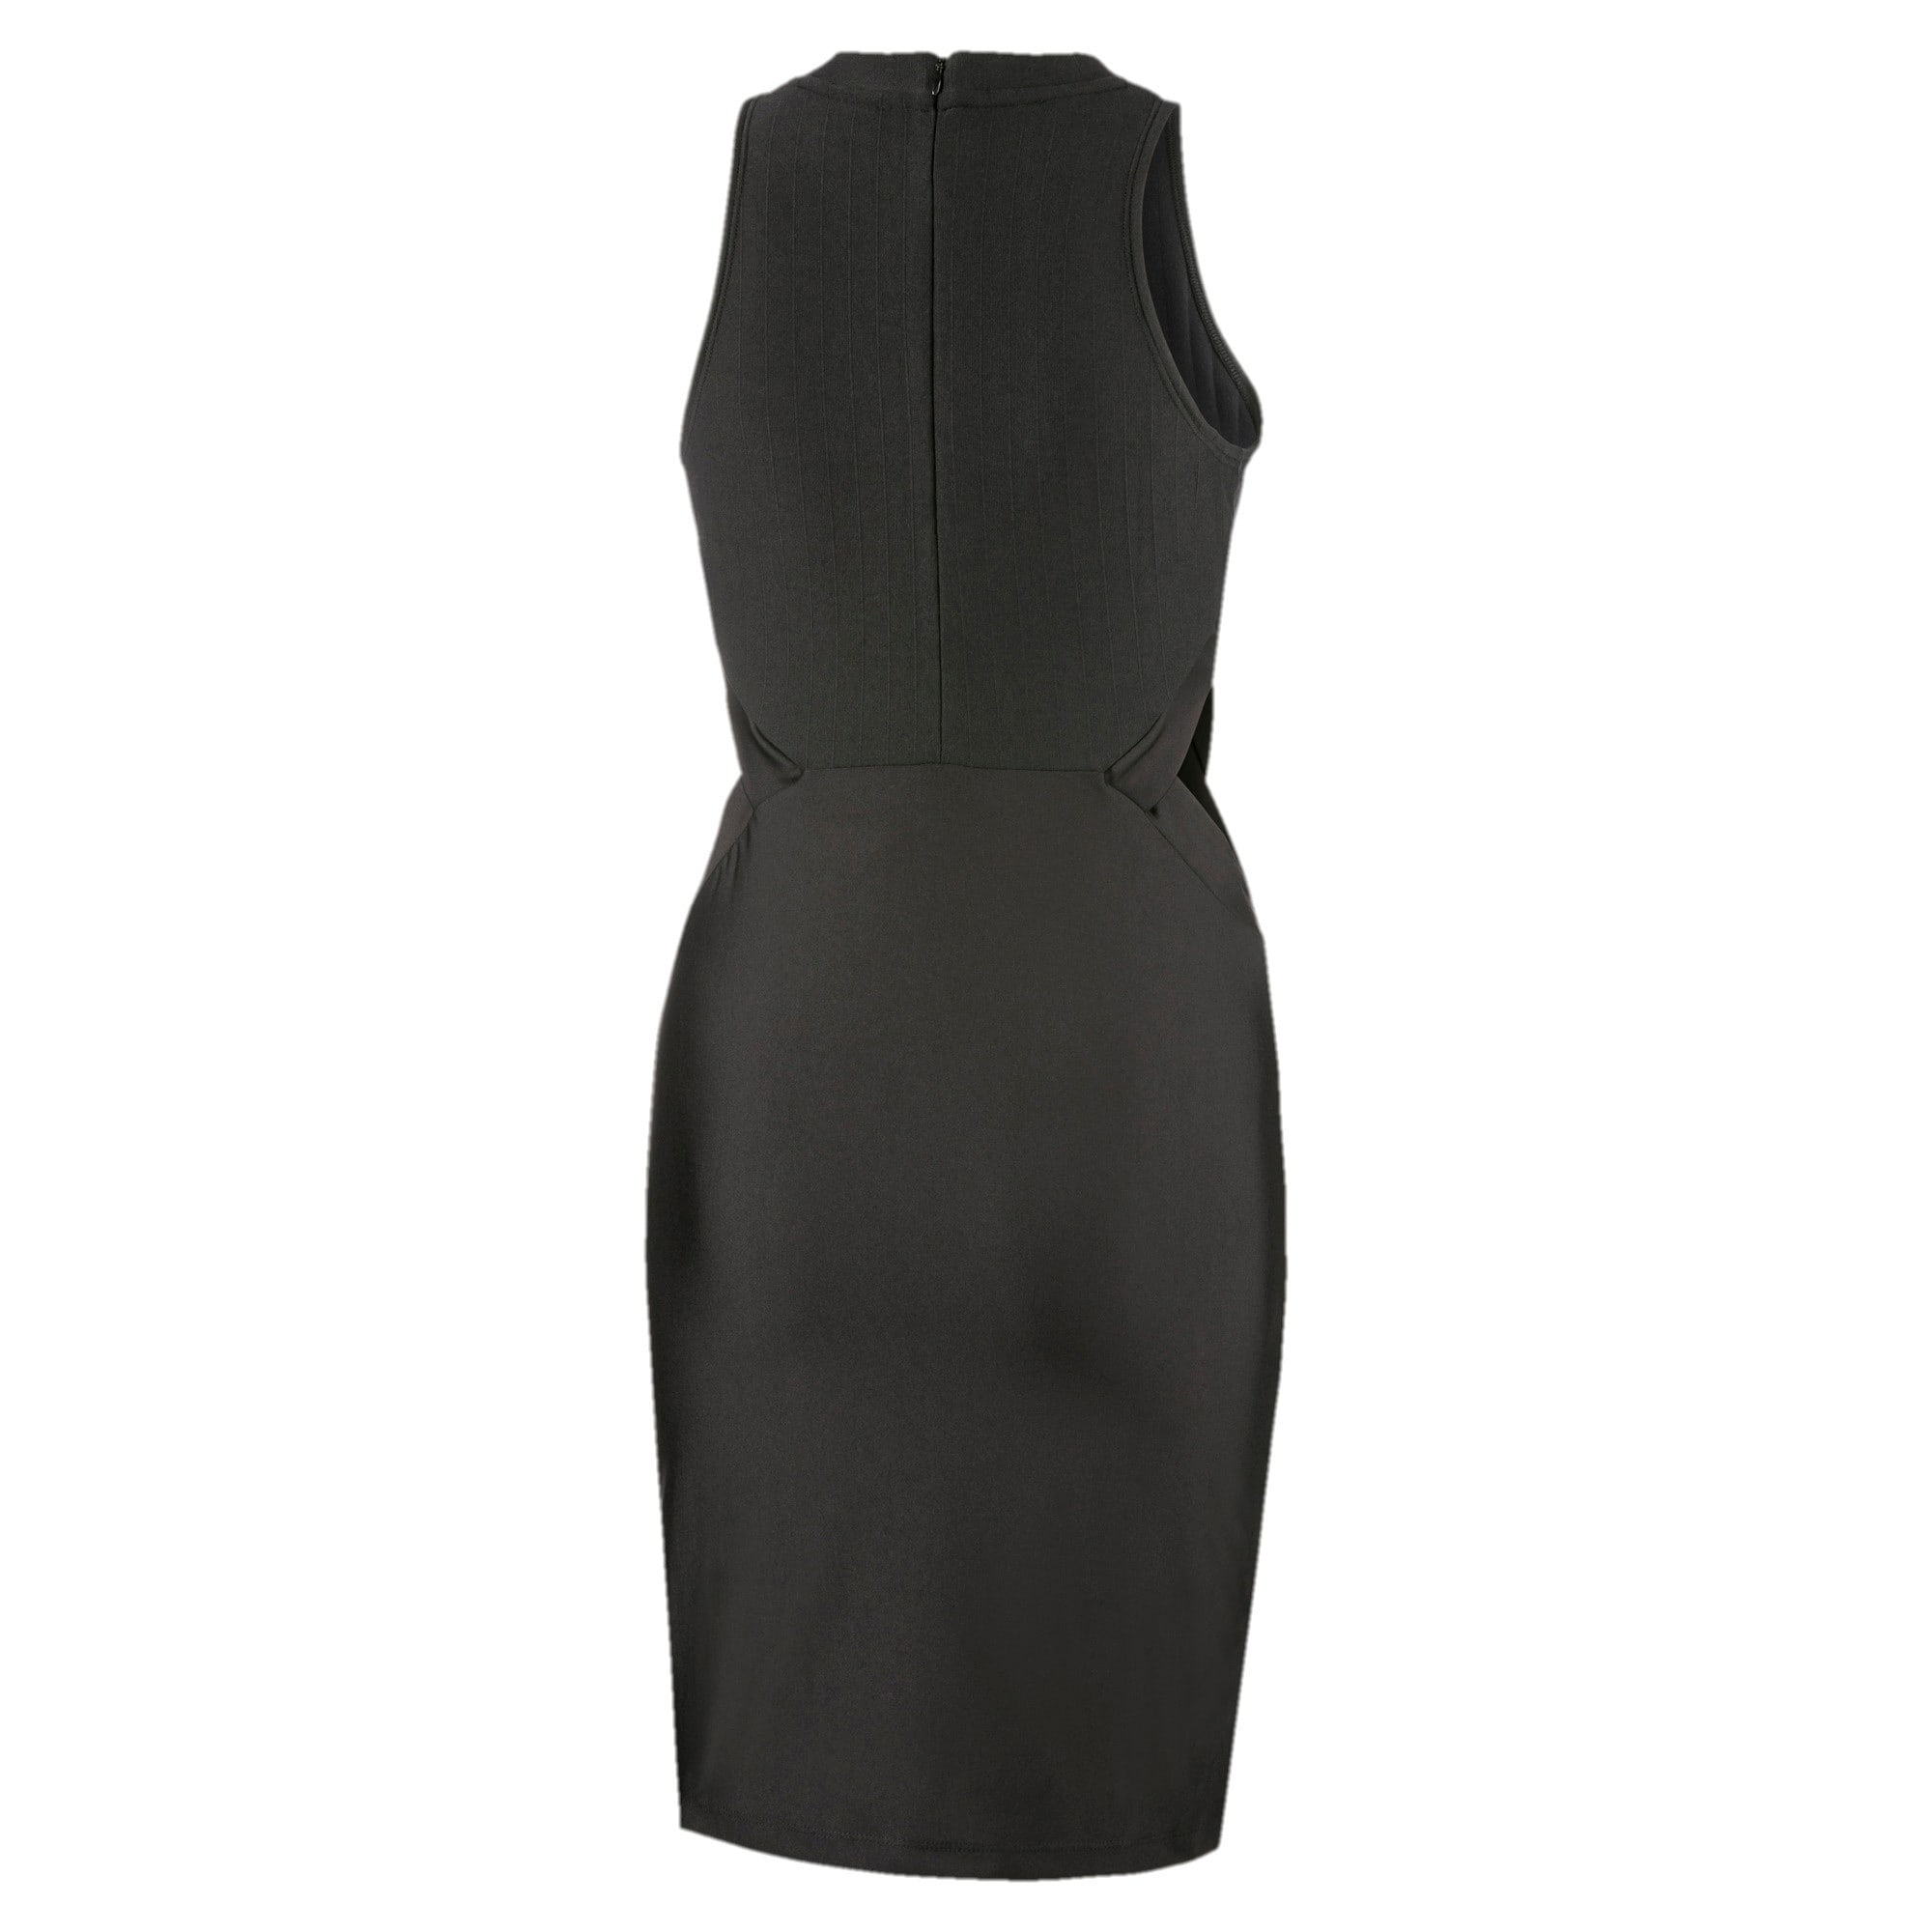 Thumbnail 2 of Classics Cut-Out Women's Dress, Puma Black, medium